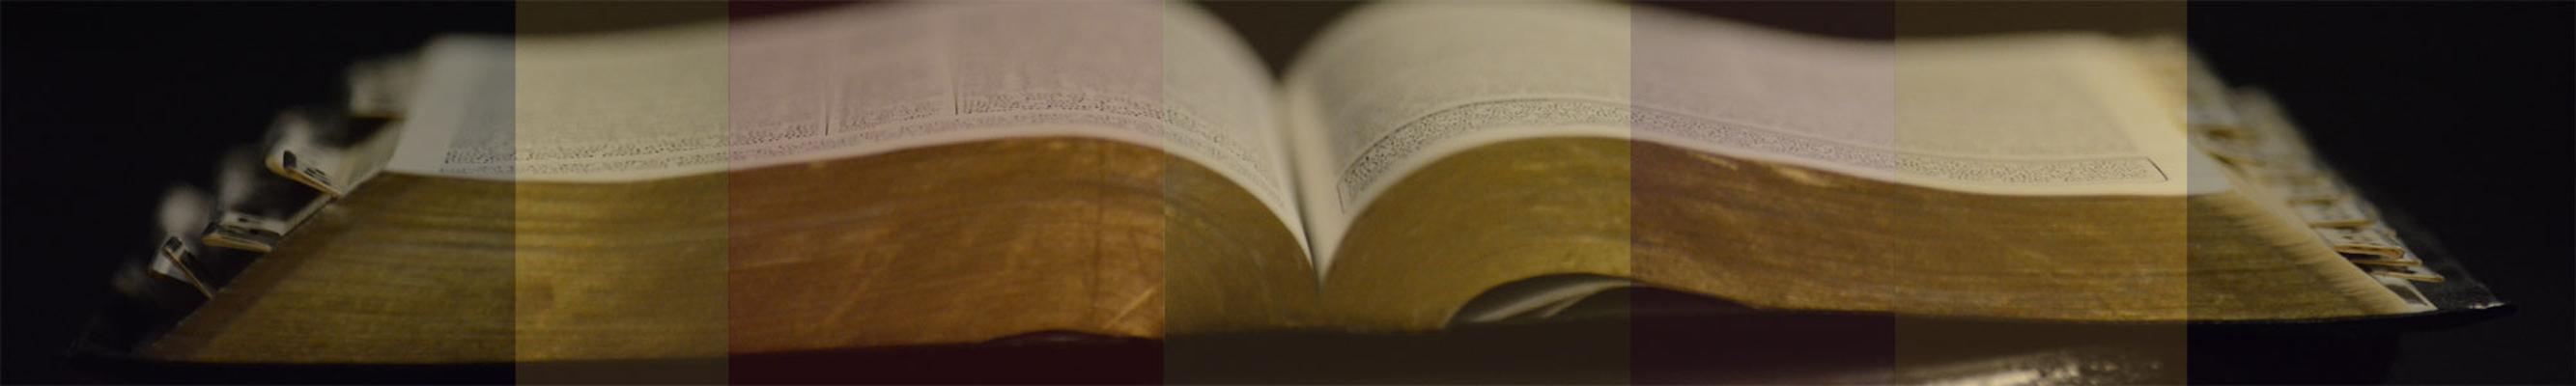 BIBLE-PANO1